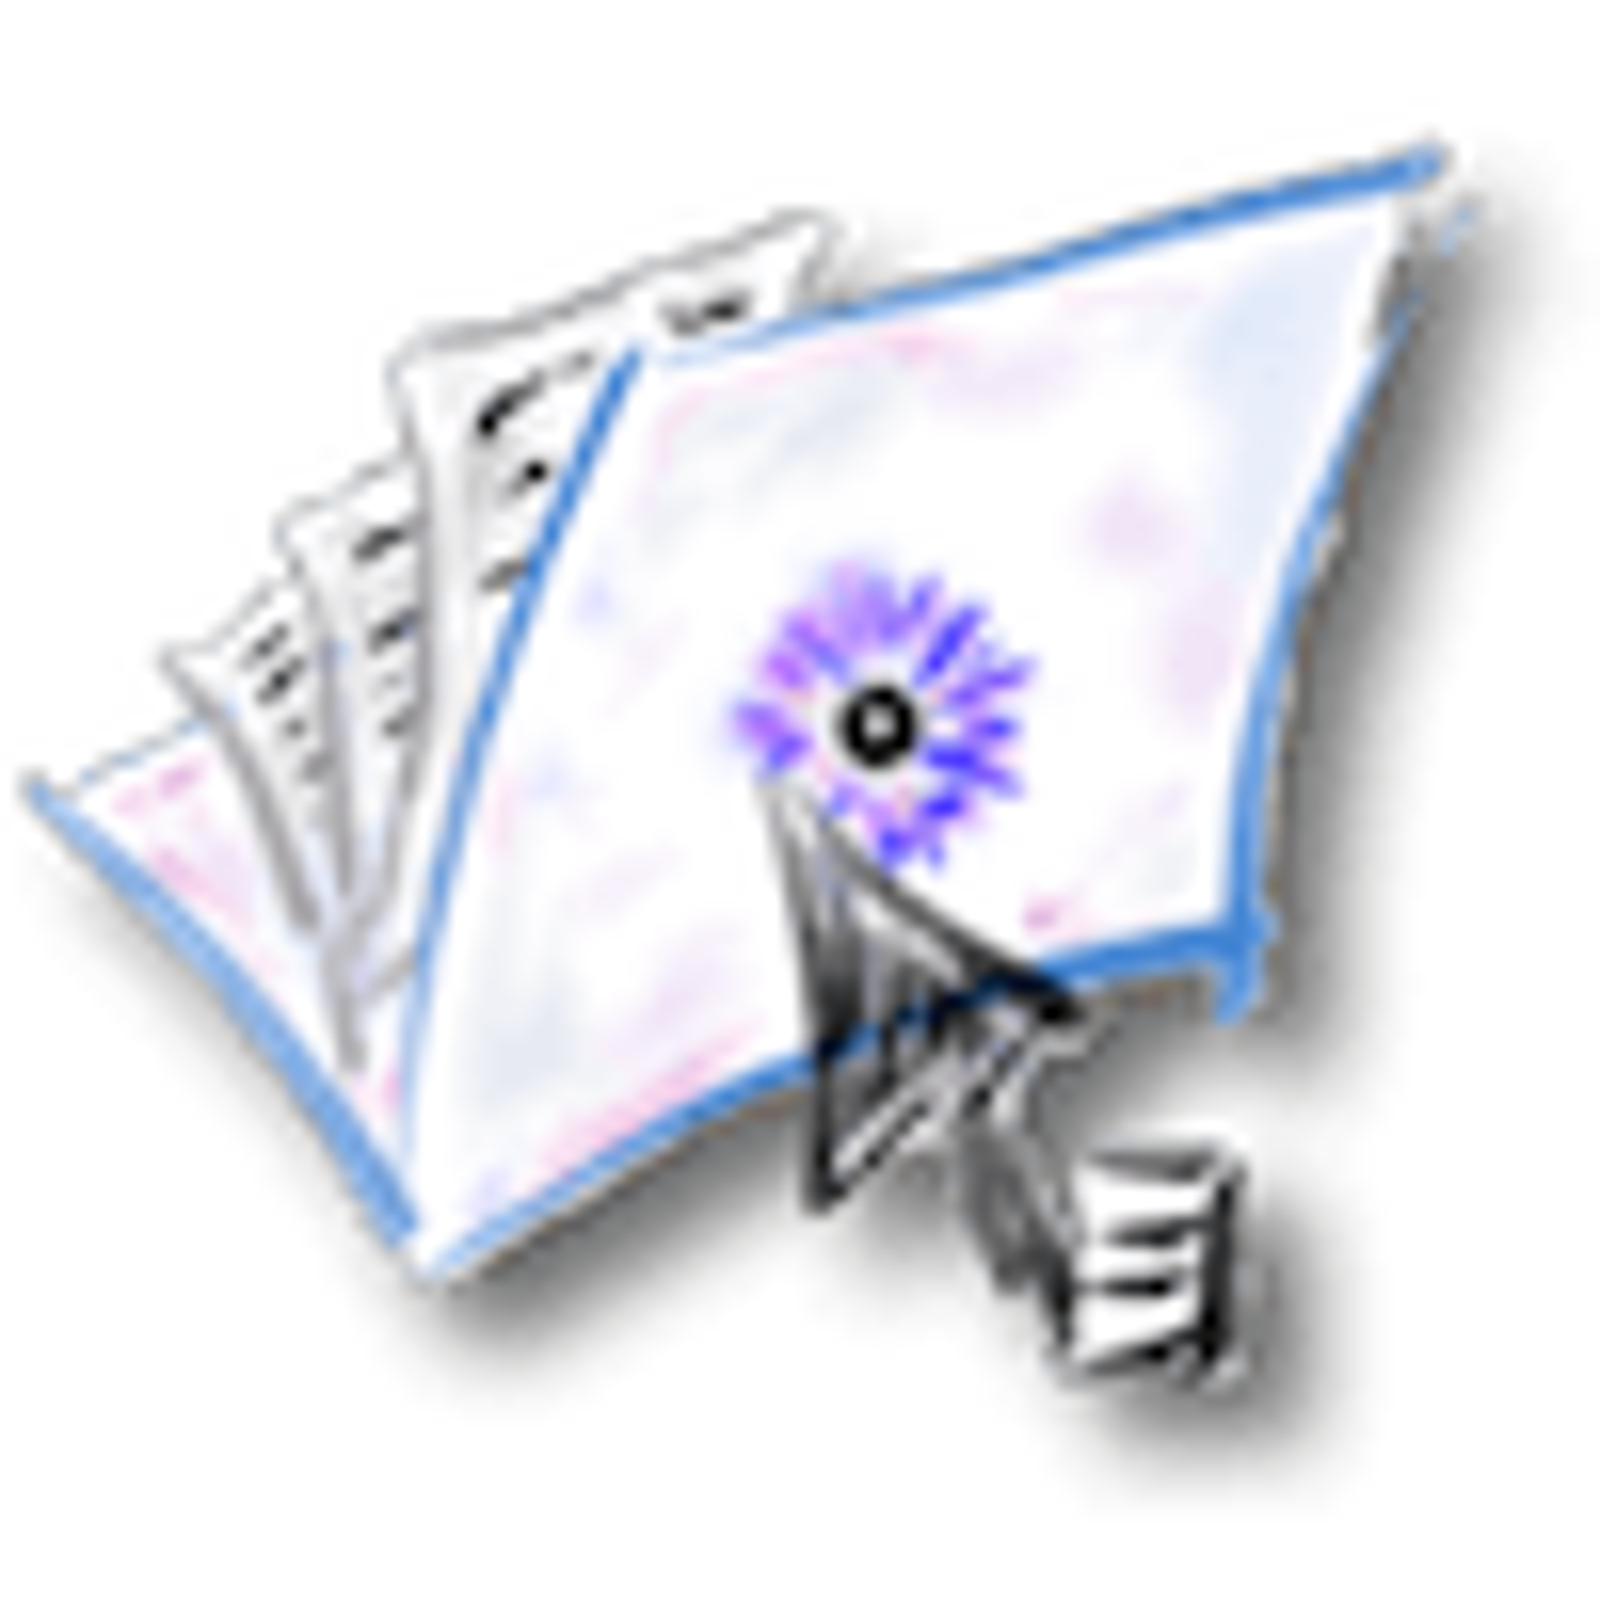 FolderGlance